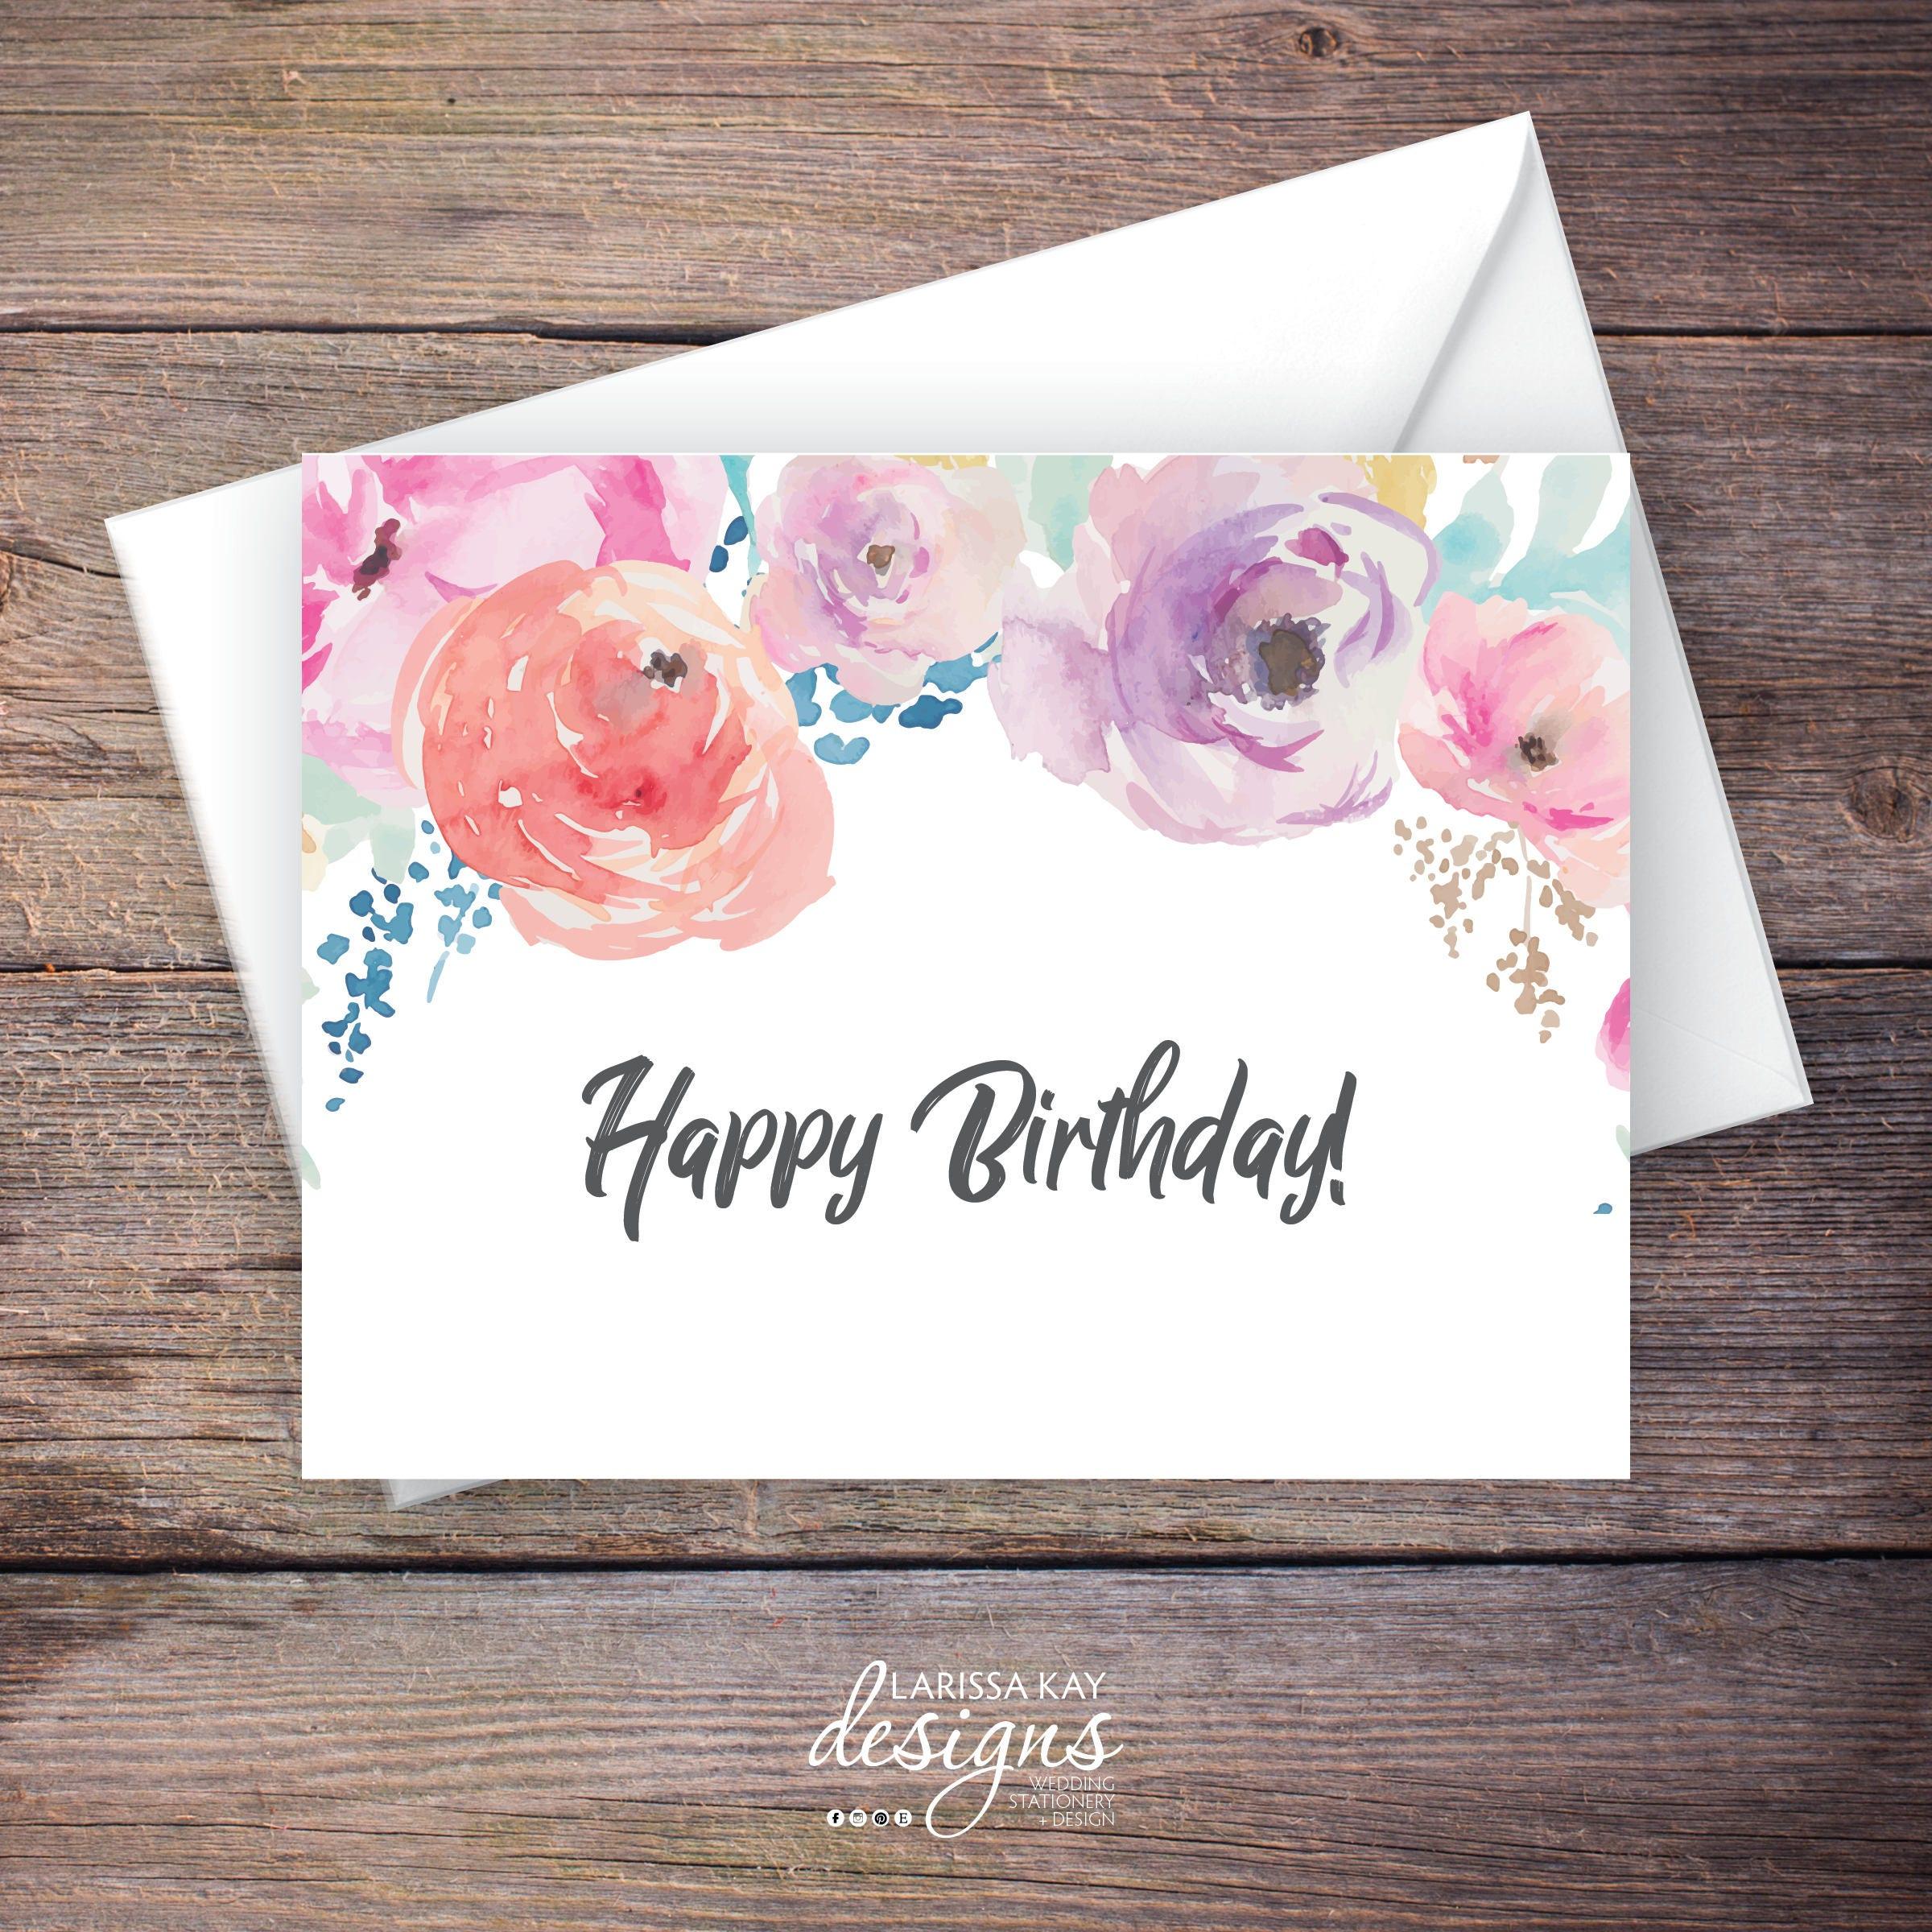 Printable floral happy birthday greeting card instant download printable floral happy birthday greeting card instant download greeting card birthday card c haven kristyandbryce Gallery